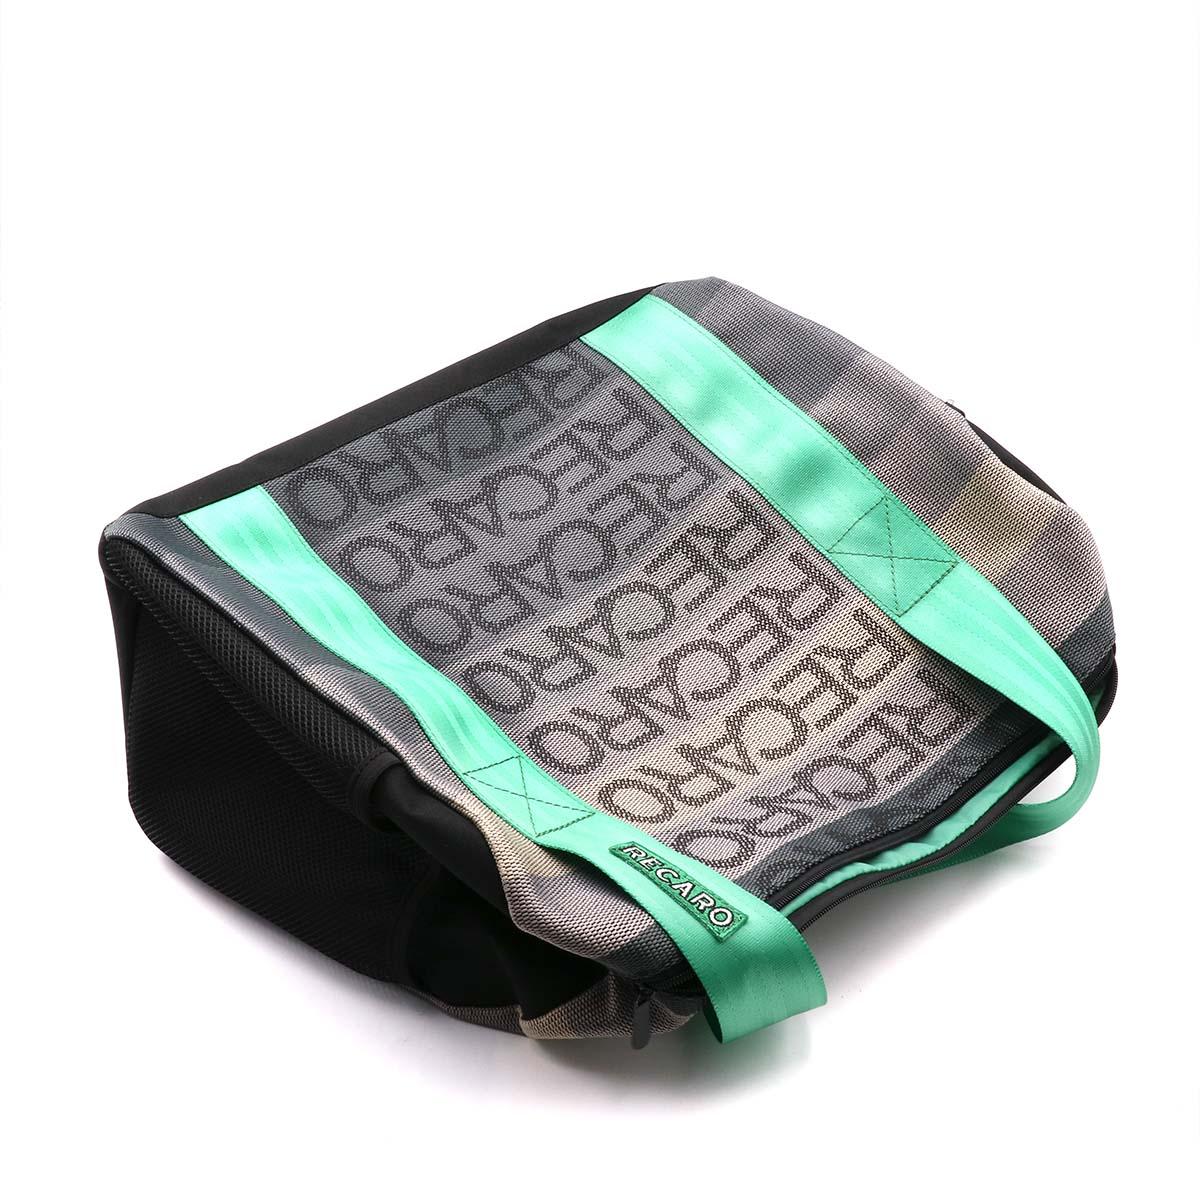 JDM Style RECARO Racing Handbag Messager Bags Traveling Bag With Racing Harness Straps